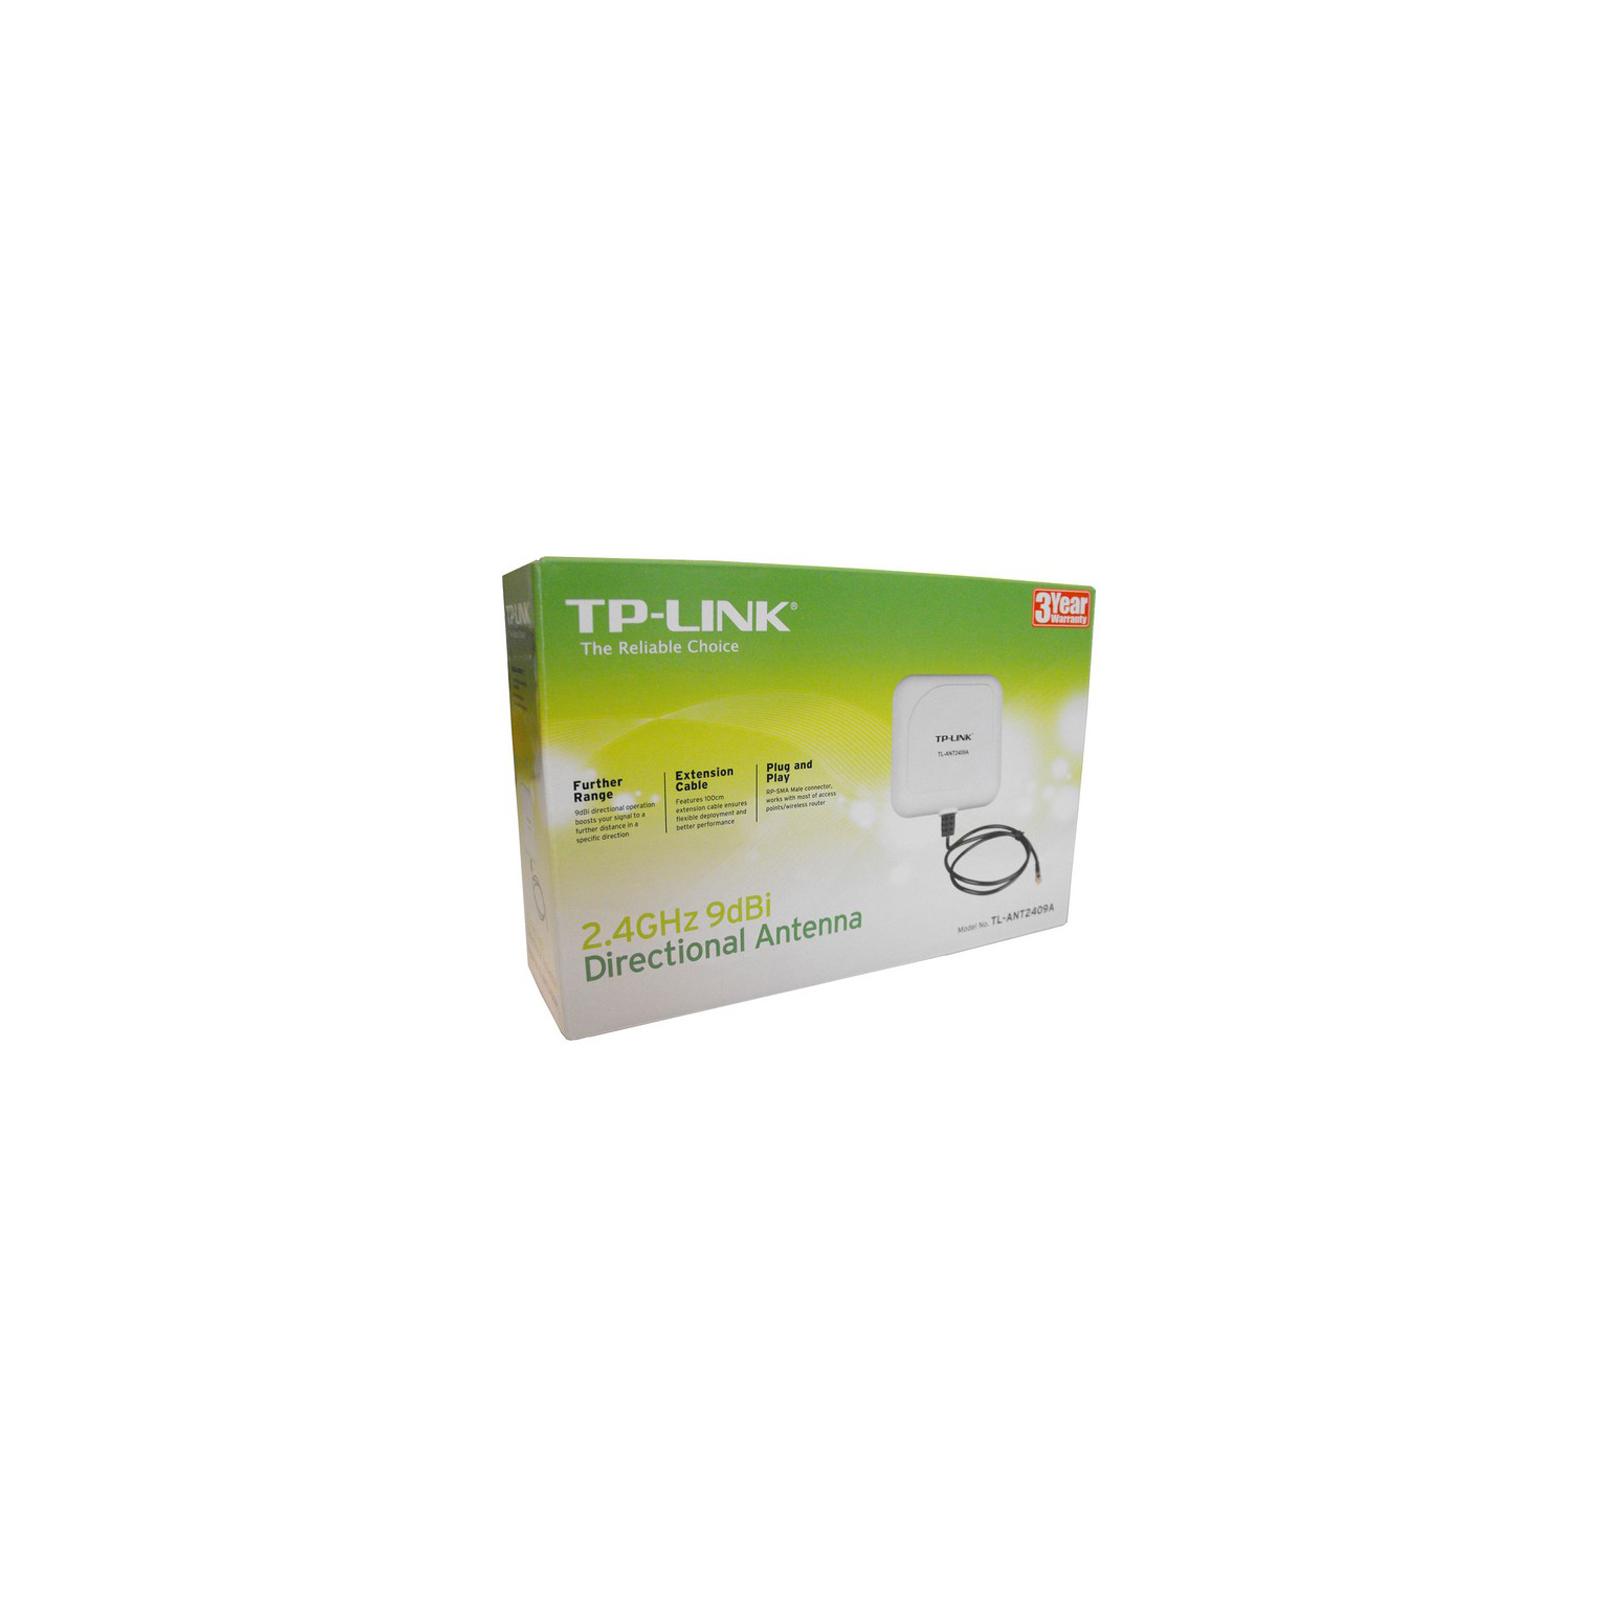 Антенна Wi-Fi Wireless Antenna 9dBi направленная, TP-Link (TL-ANT2409A) изображение 3